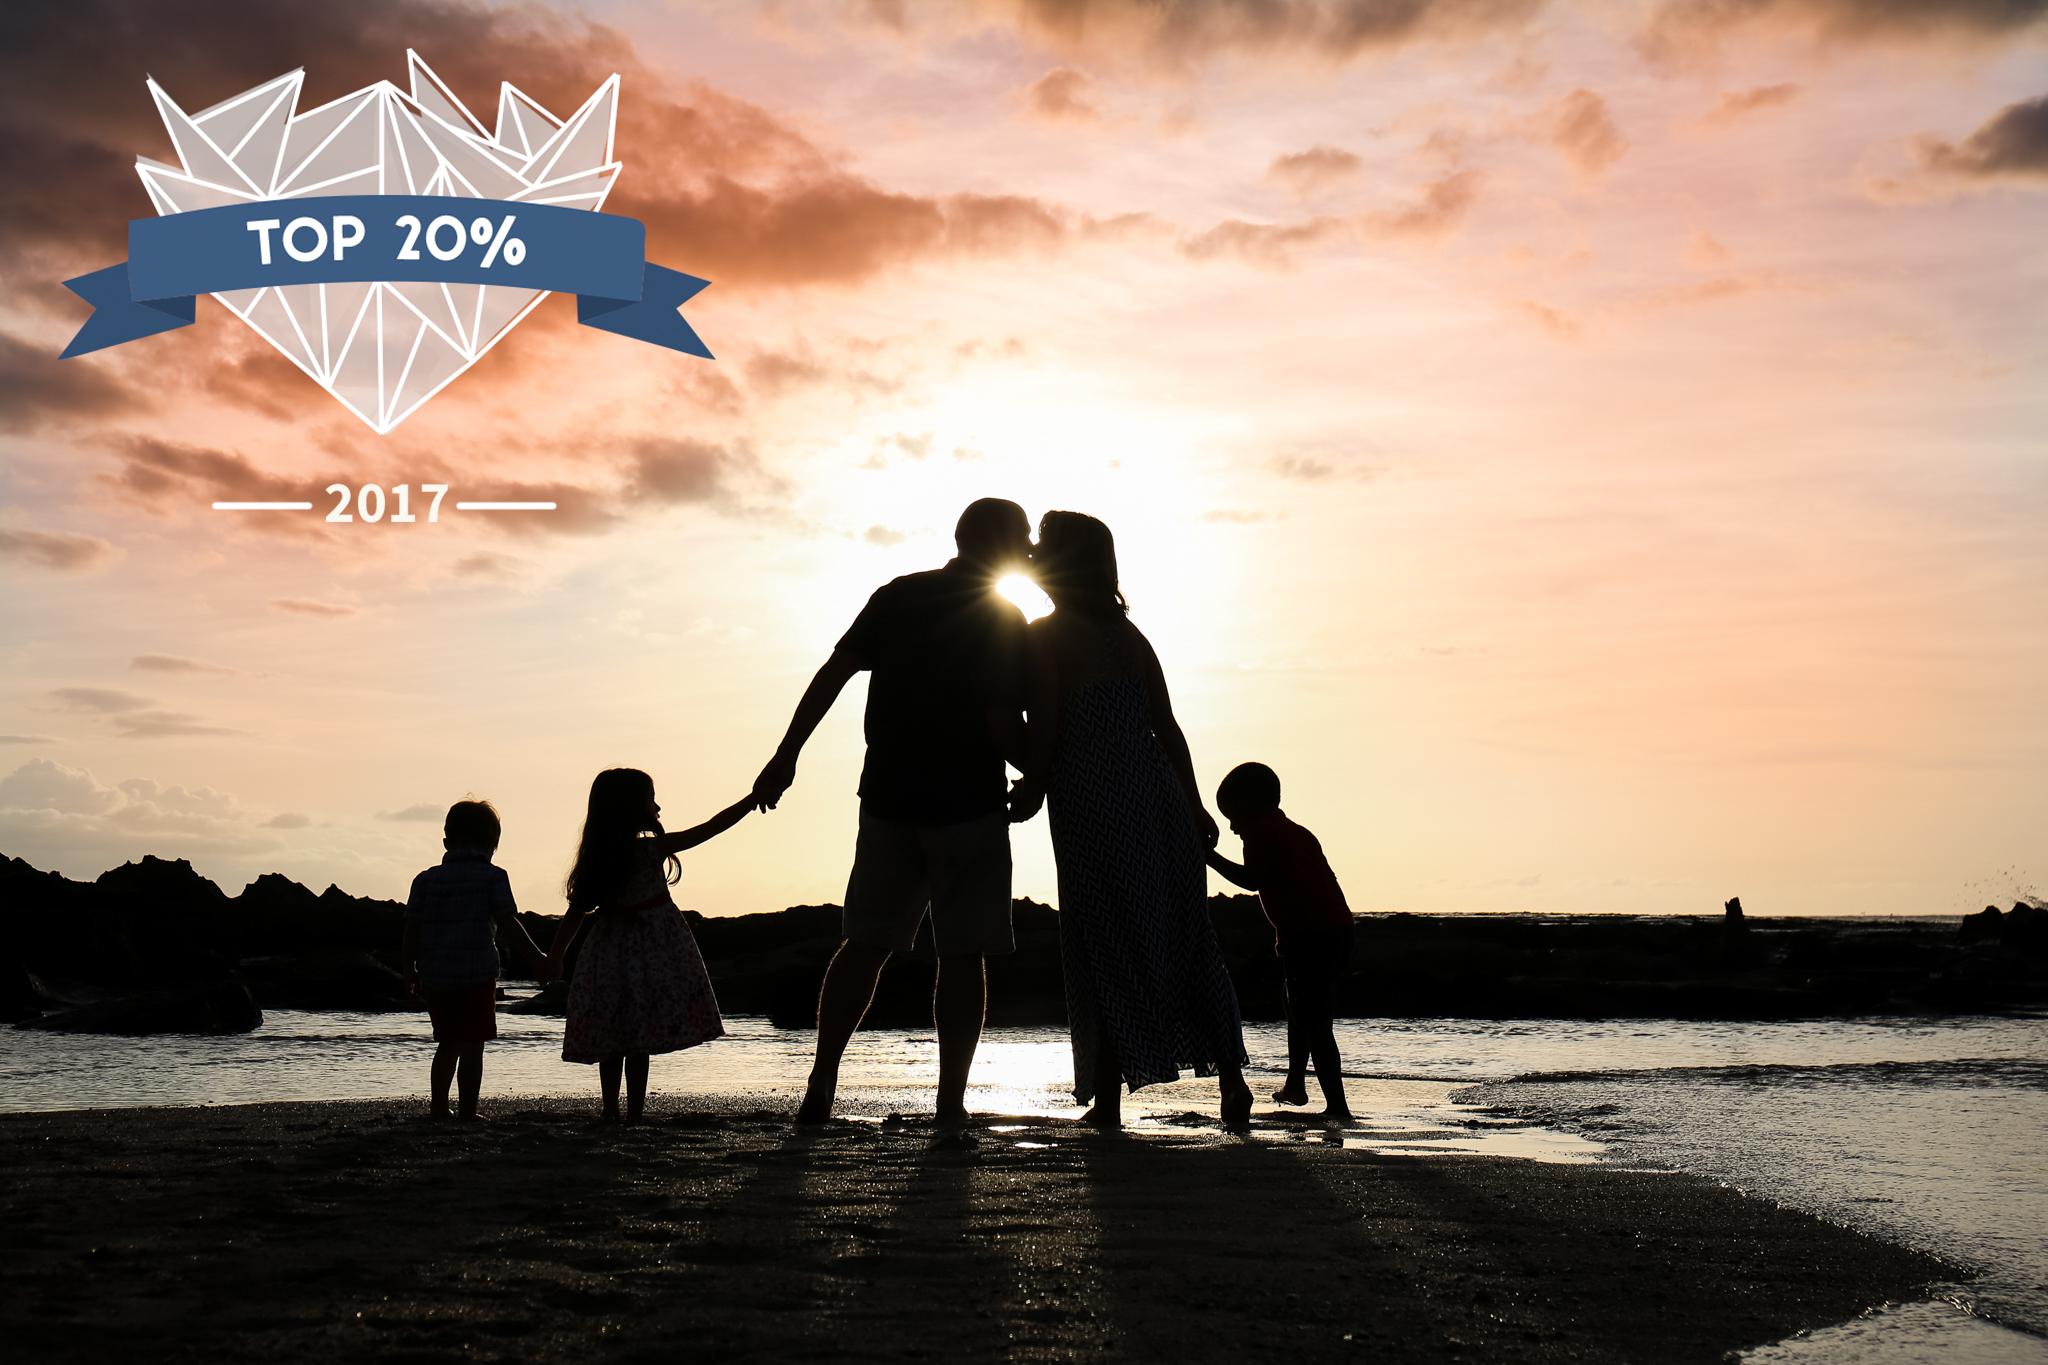 non watermarked 2017 shoot and share photo awards aloha sunshine photography 11November 06, 2016.jpg